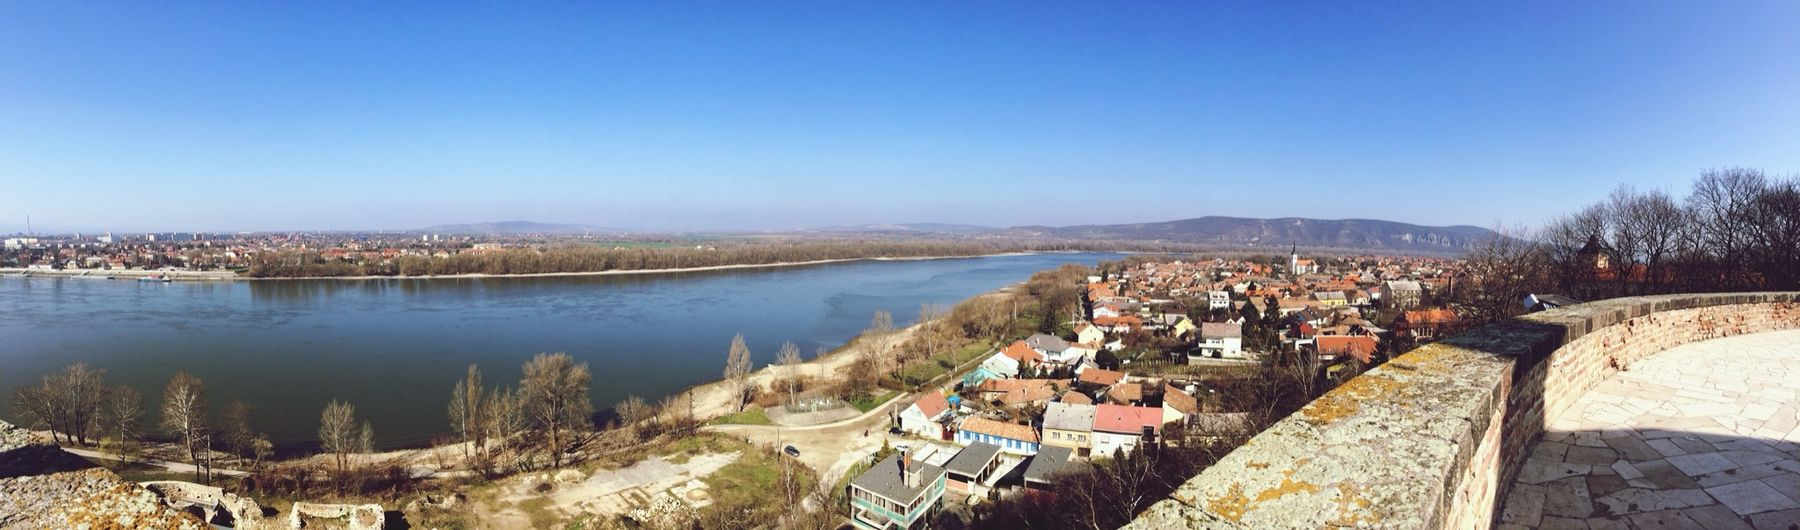 Taking Photos Hungary River Spring ???